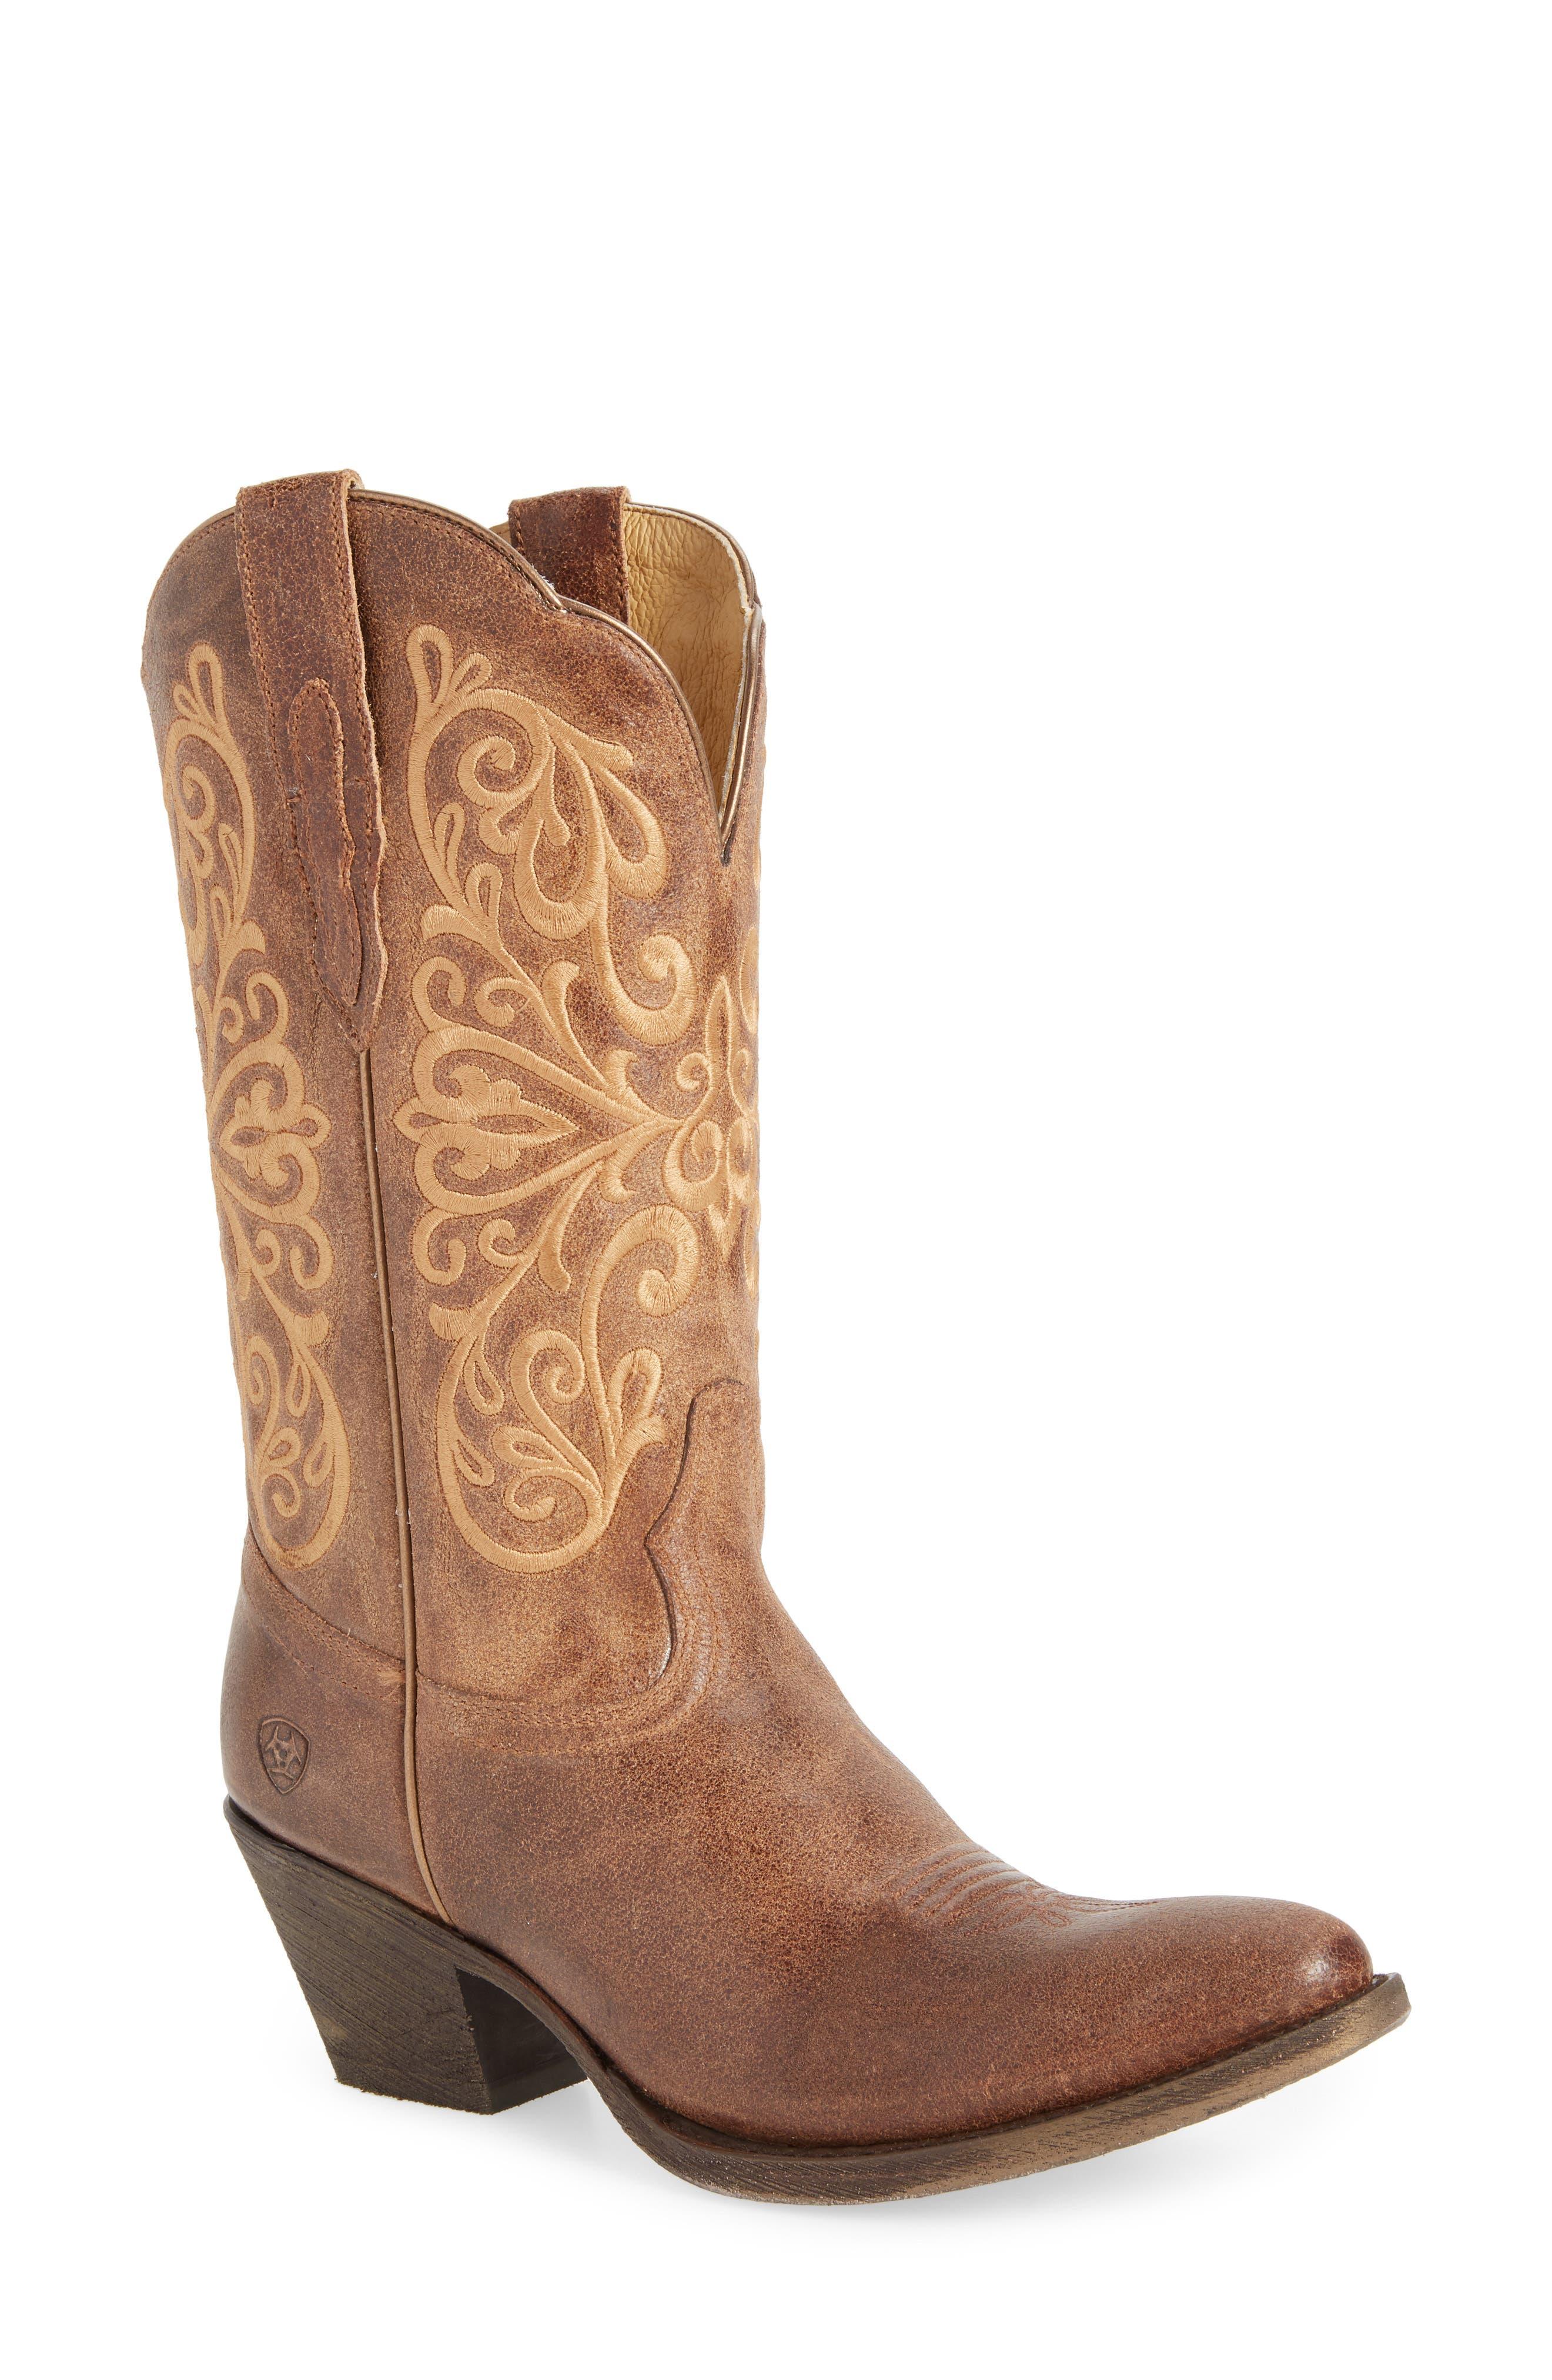 Terra Bella Western Boot,                         Main,                         color, TURNBACK TAN LEATHER